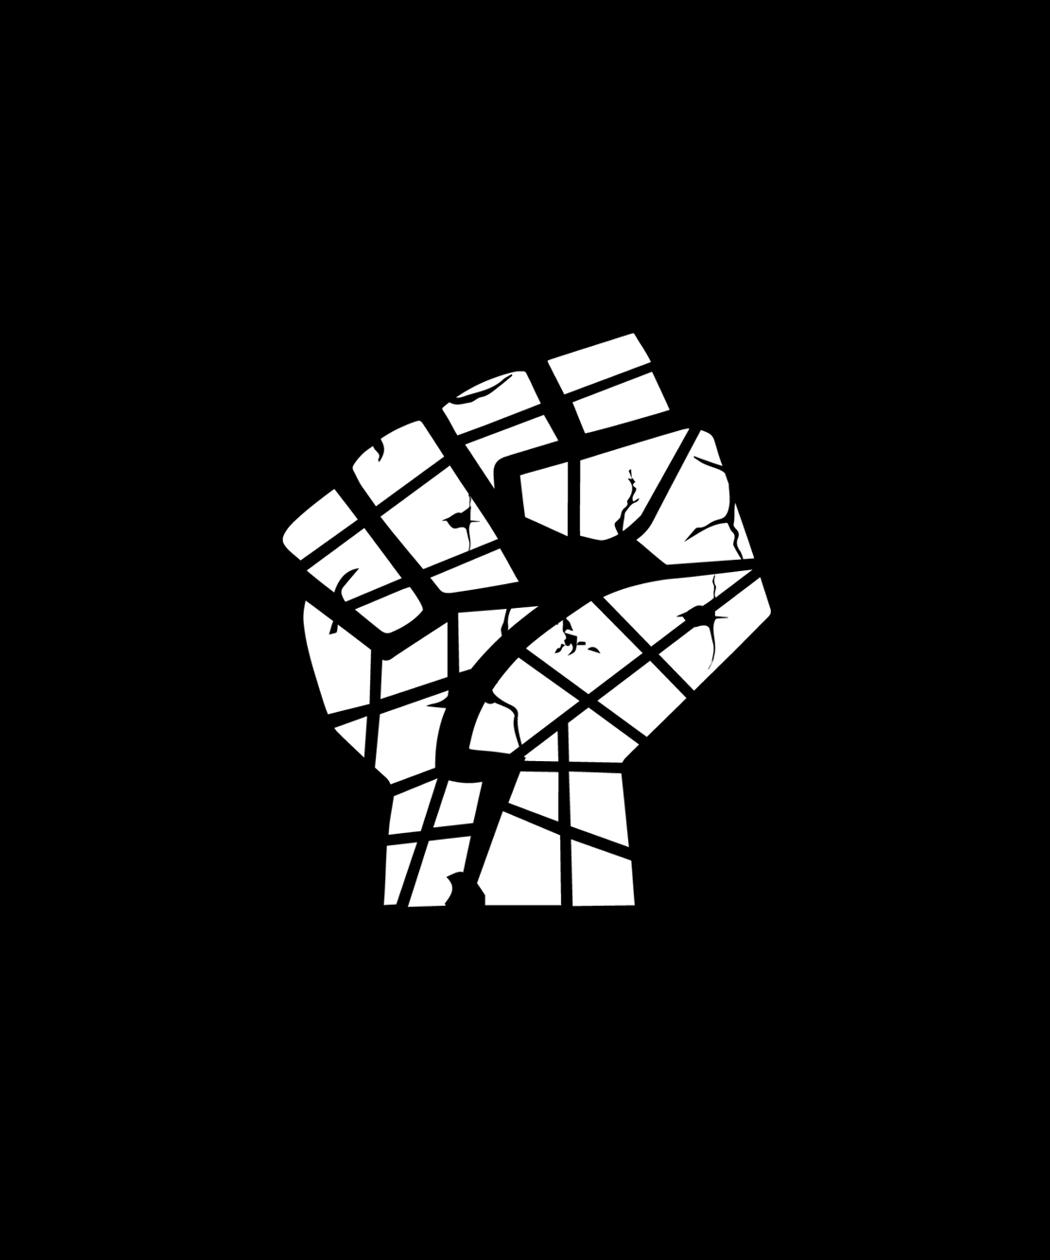 Hand of stone brand icon design